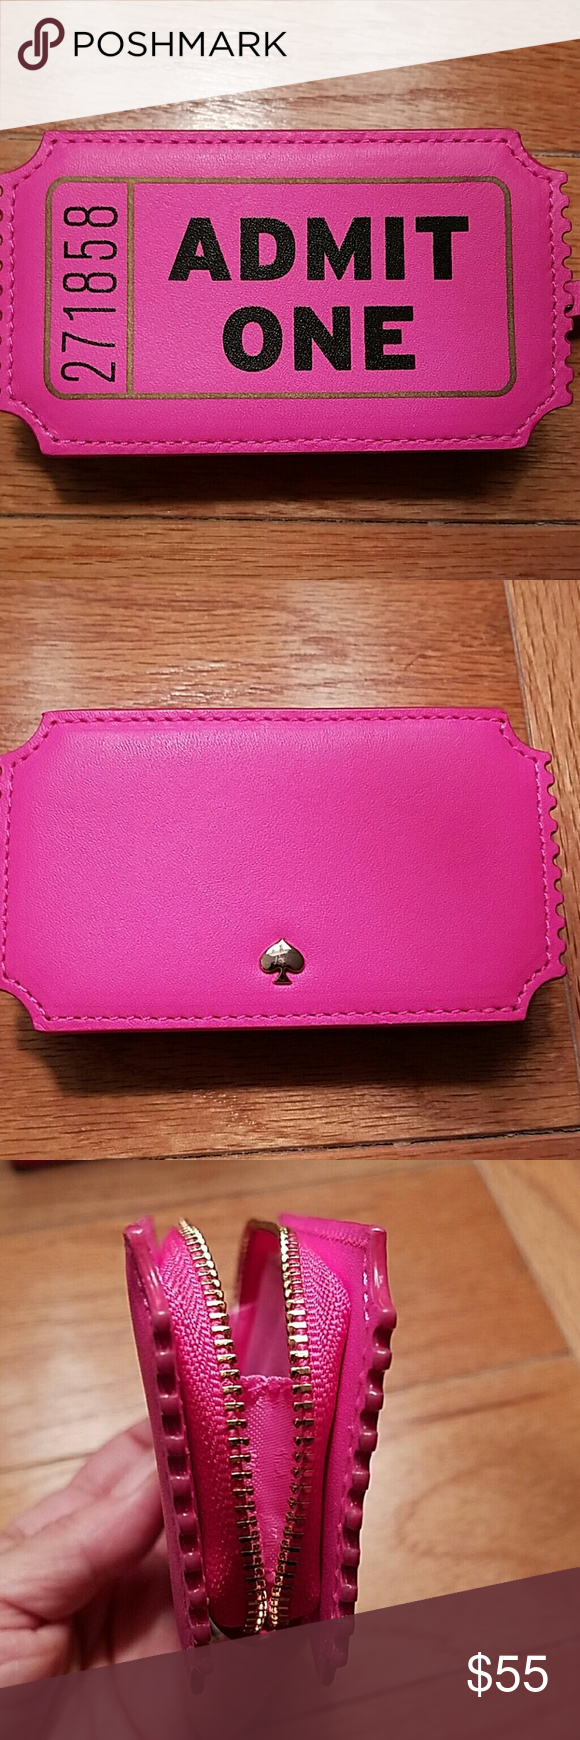 kate spade admit one coin purse